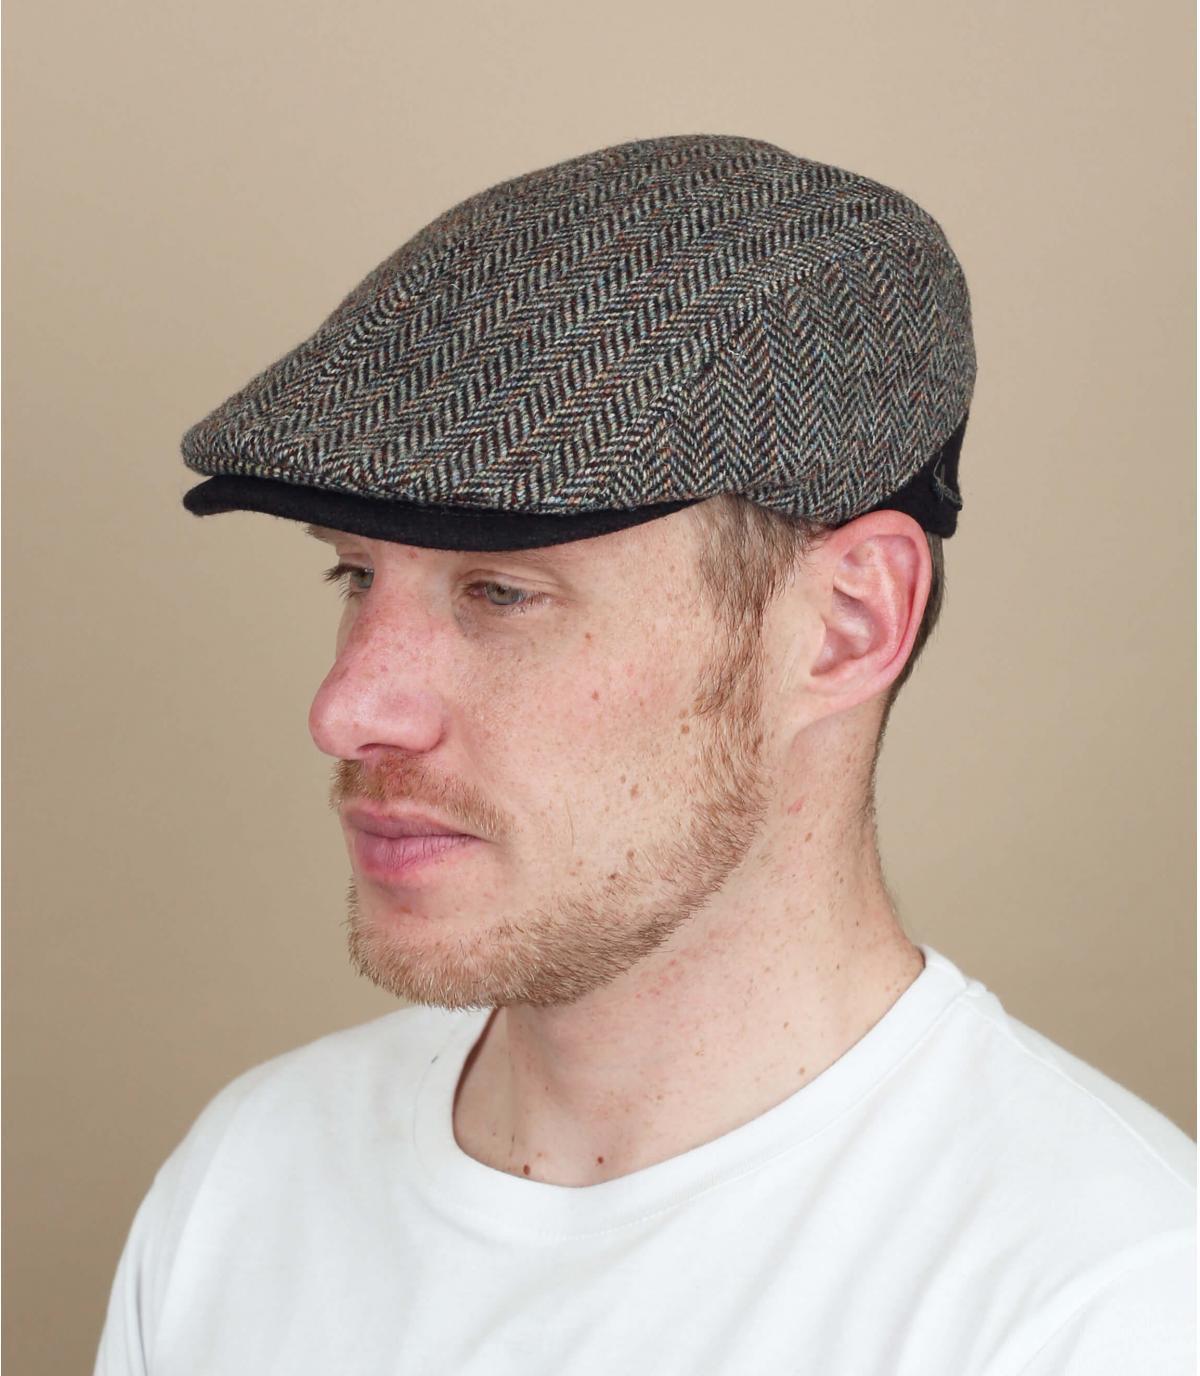 gorra marrón lana espiga